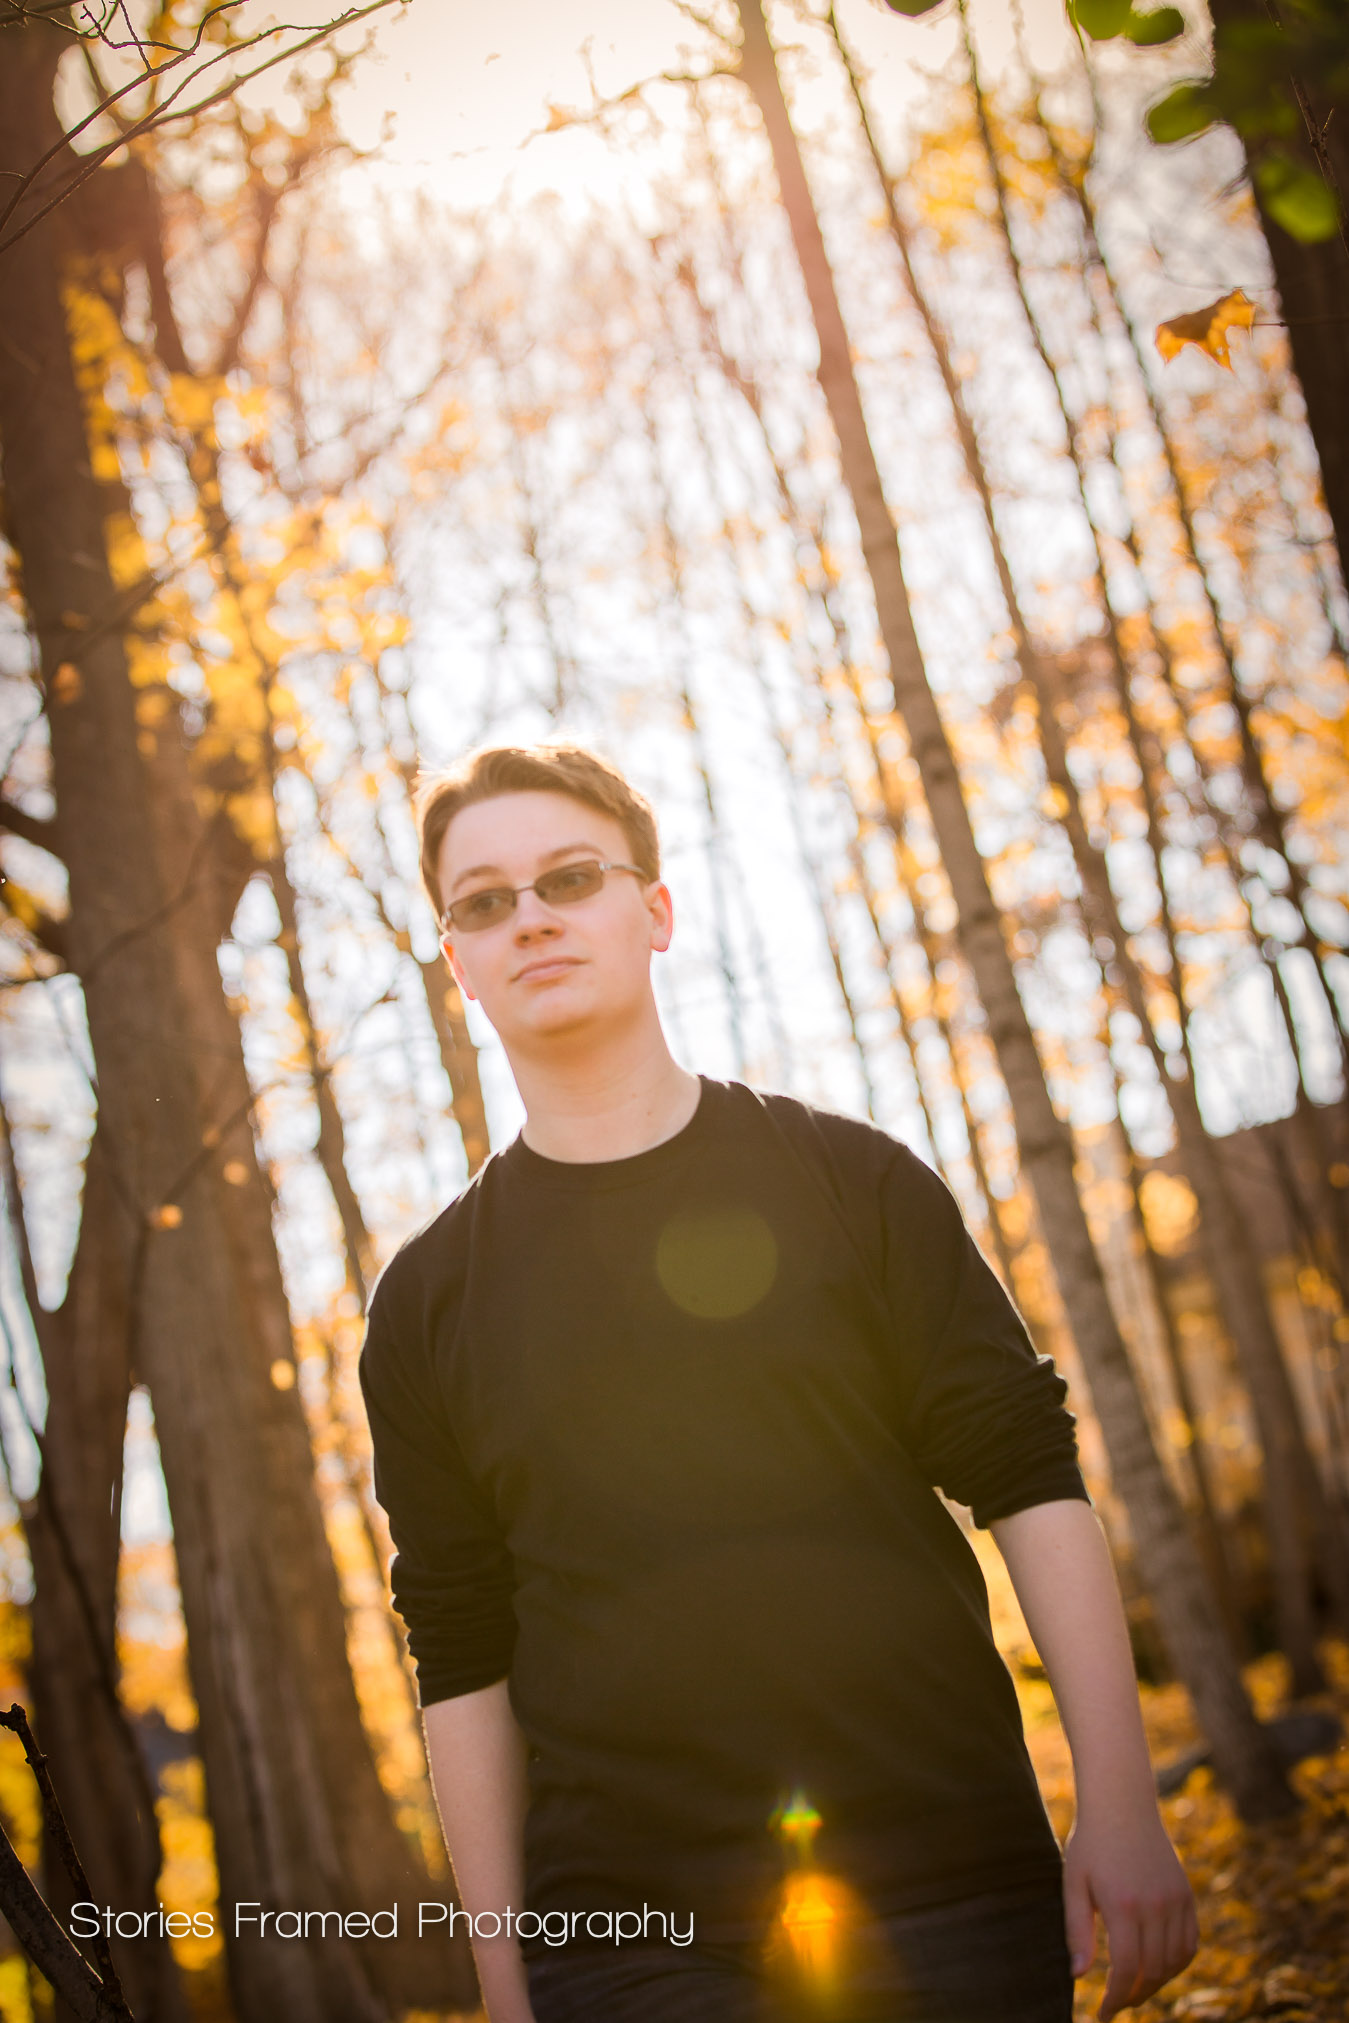 Nathan-Hale-HS-class-of-2017-fall-sunshine